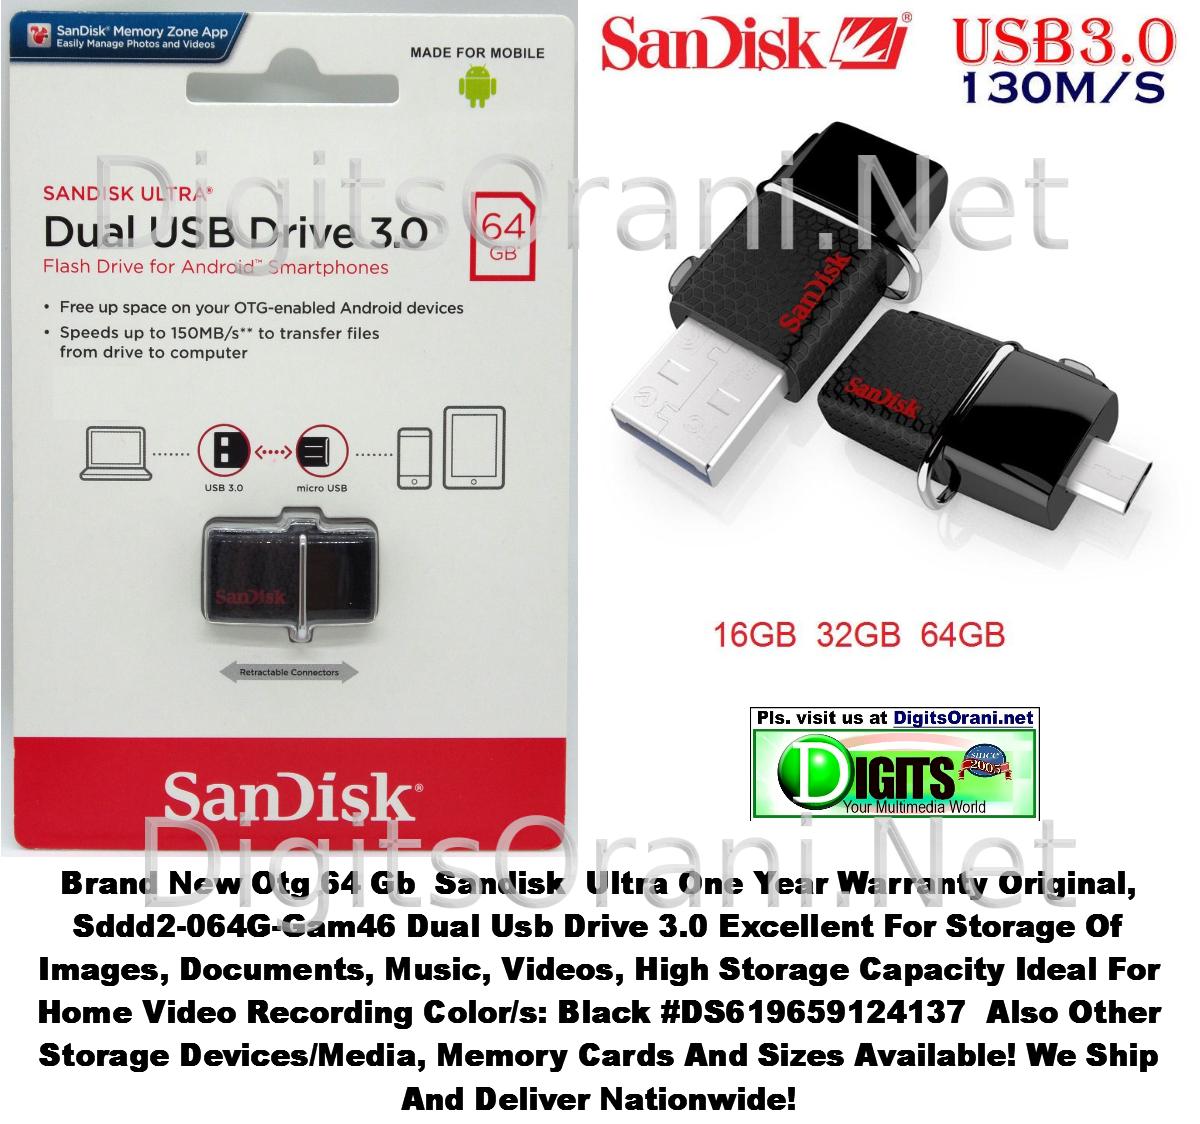 Original Memory Otg 64gb Sandisk Ultra Dual Usb Drive 30 Sddd2 064g Type C 32gb Mgctlbxnmzp Mgctlbxv525 Mgctlbxlc